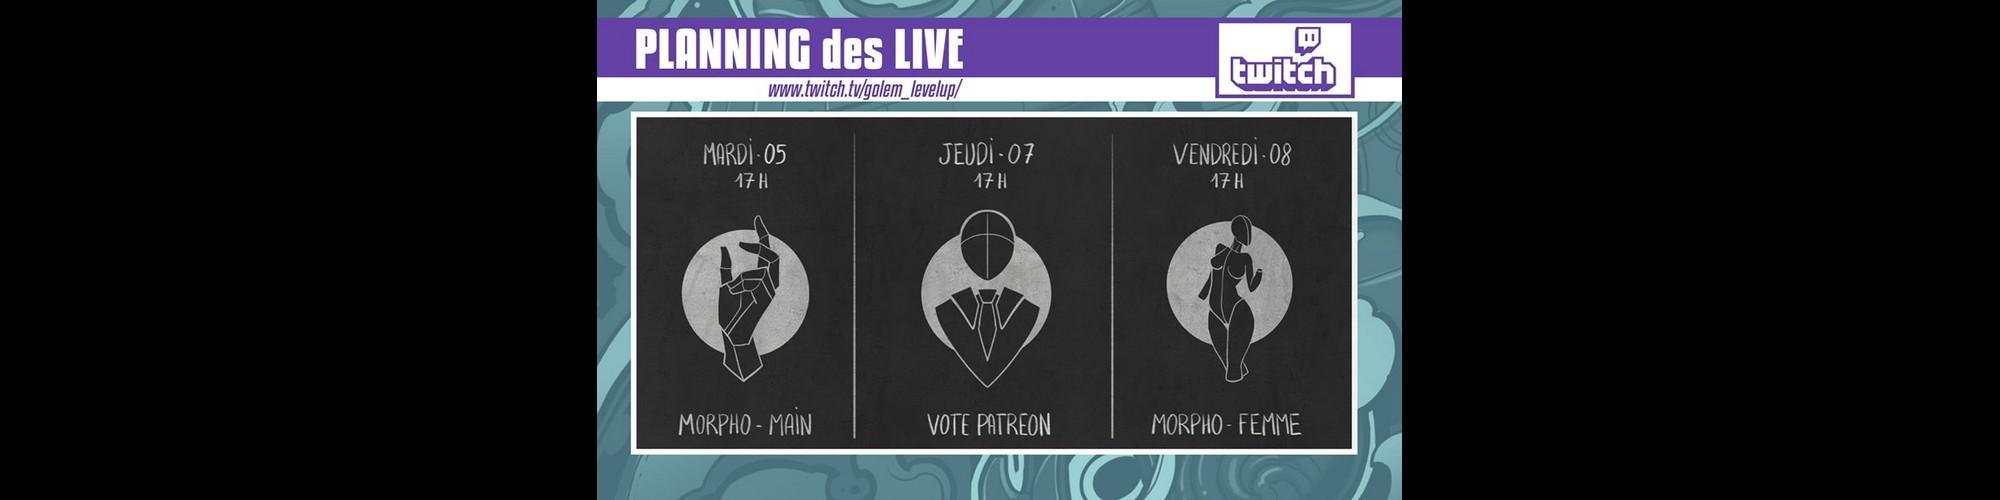 Programme Live! Twitch Golem